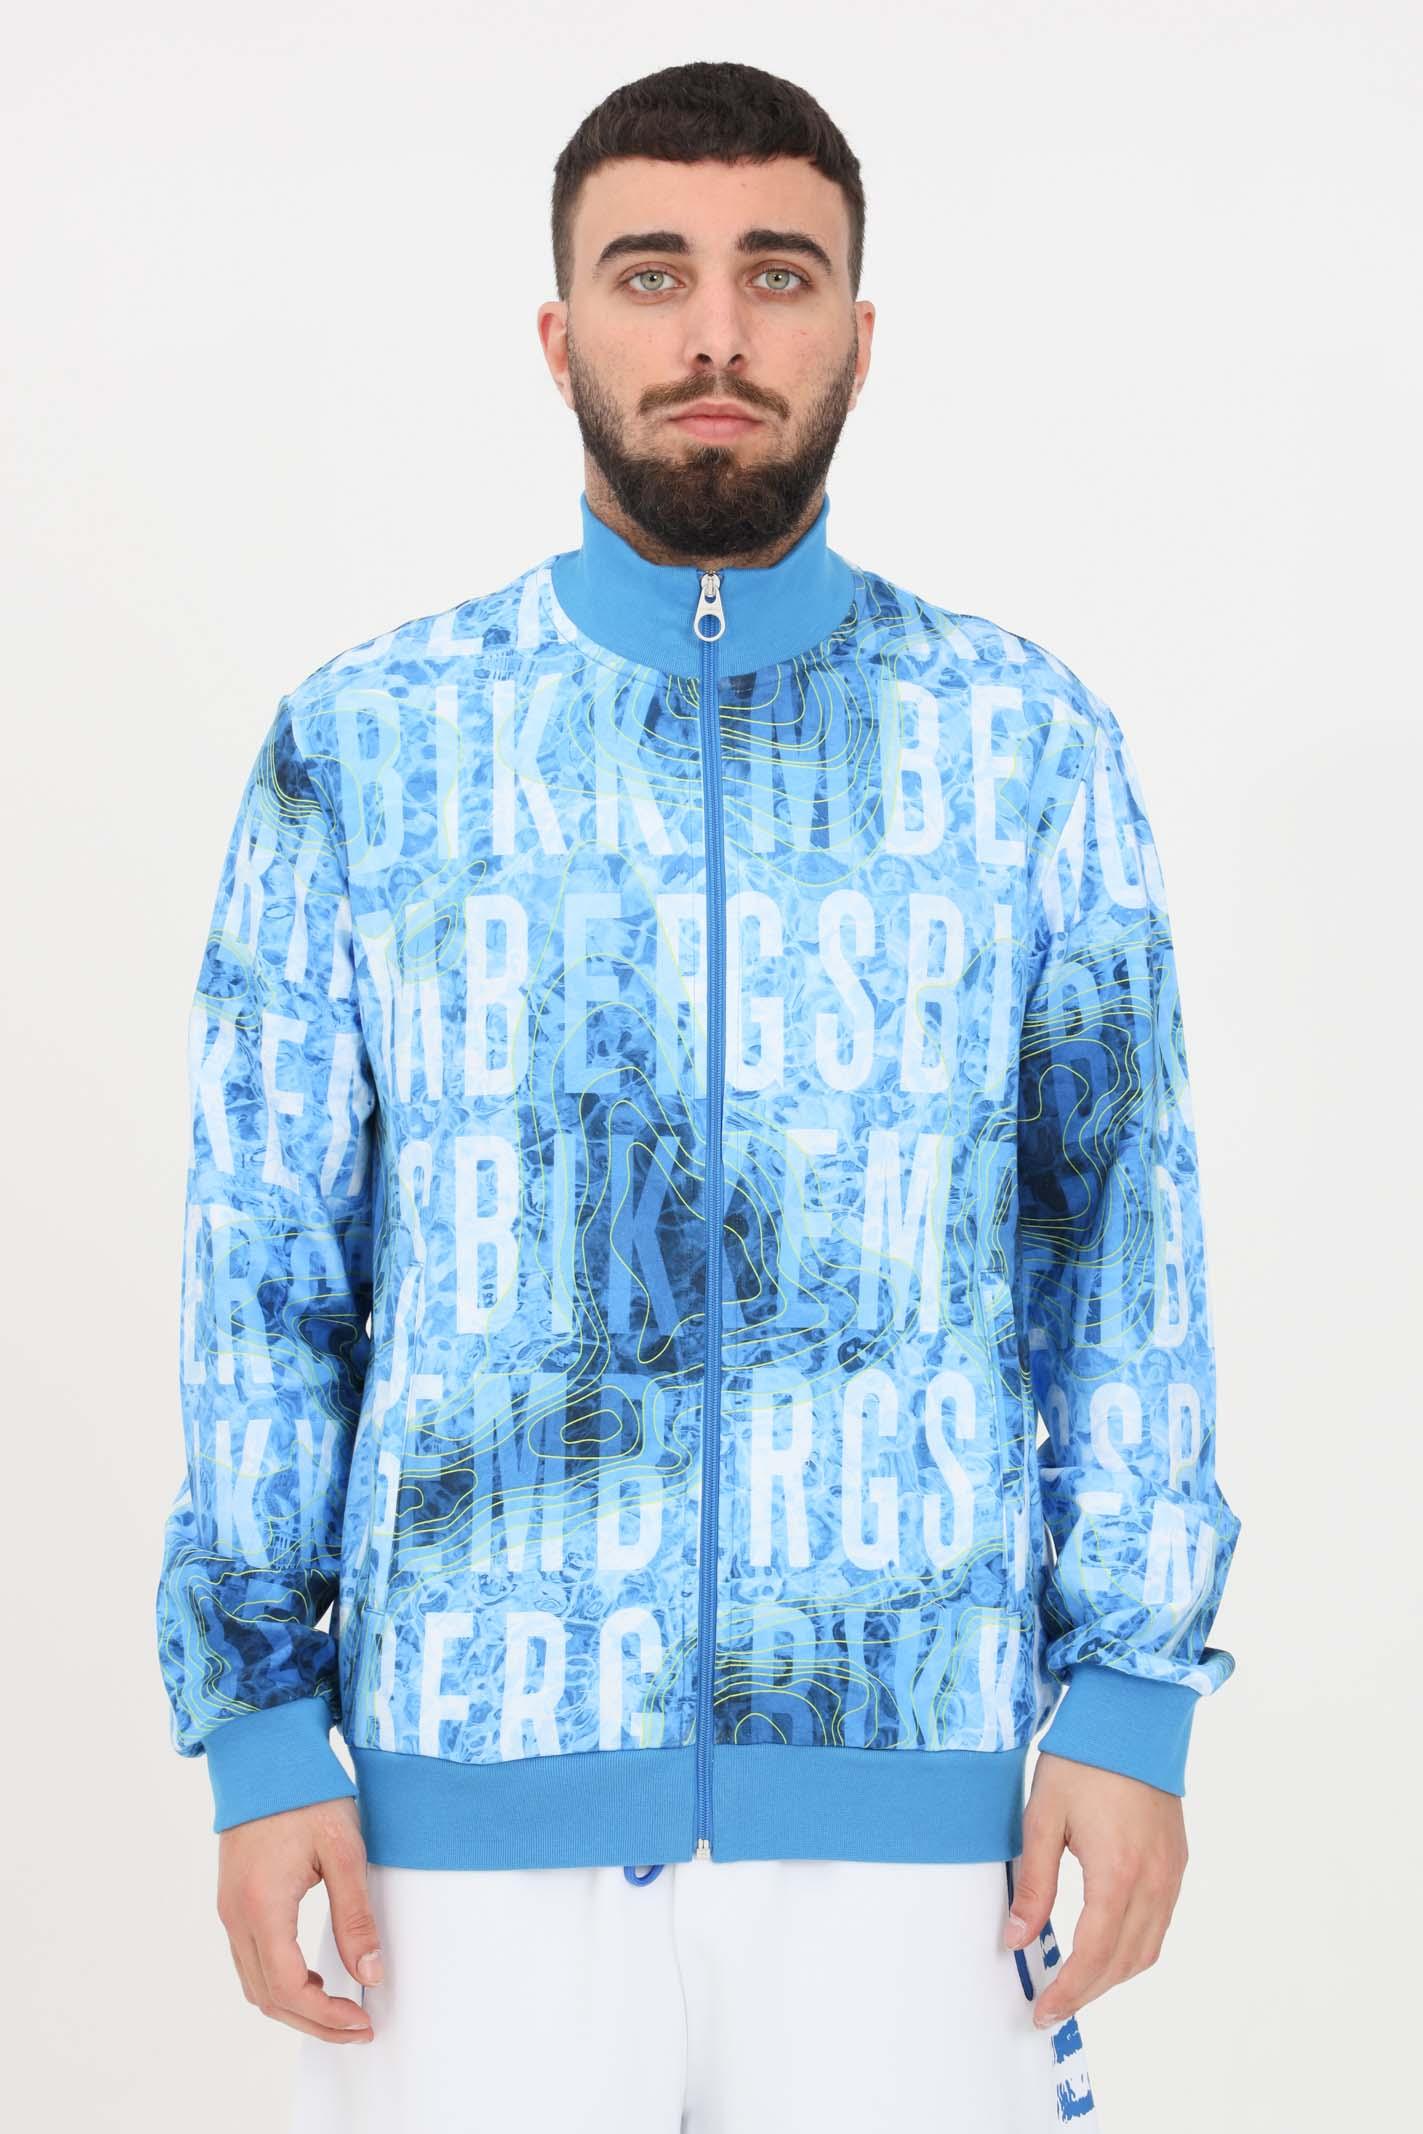 Felpa uomo blue bikkembergs con zip e stampa allover BIKKEMBERGS | Felpe | C305100E22510021